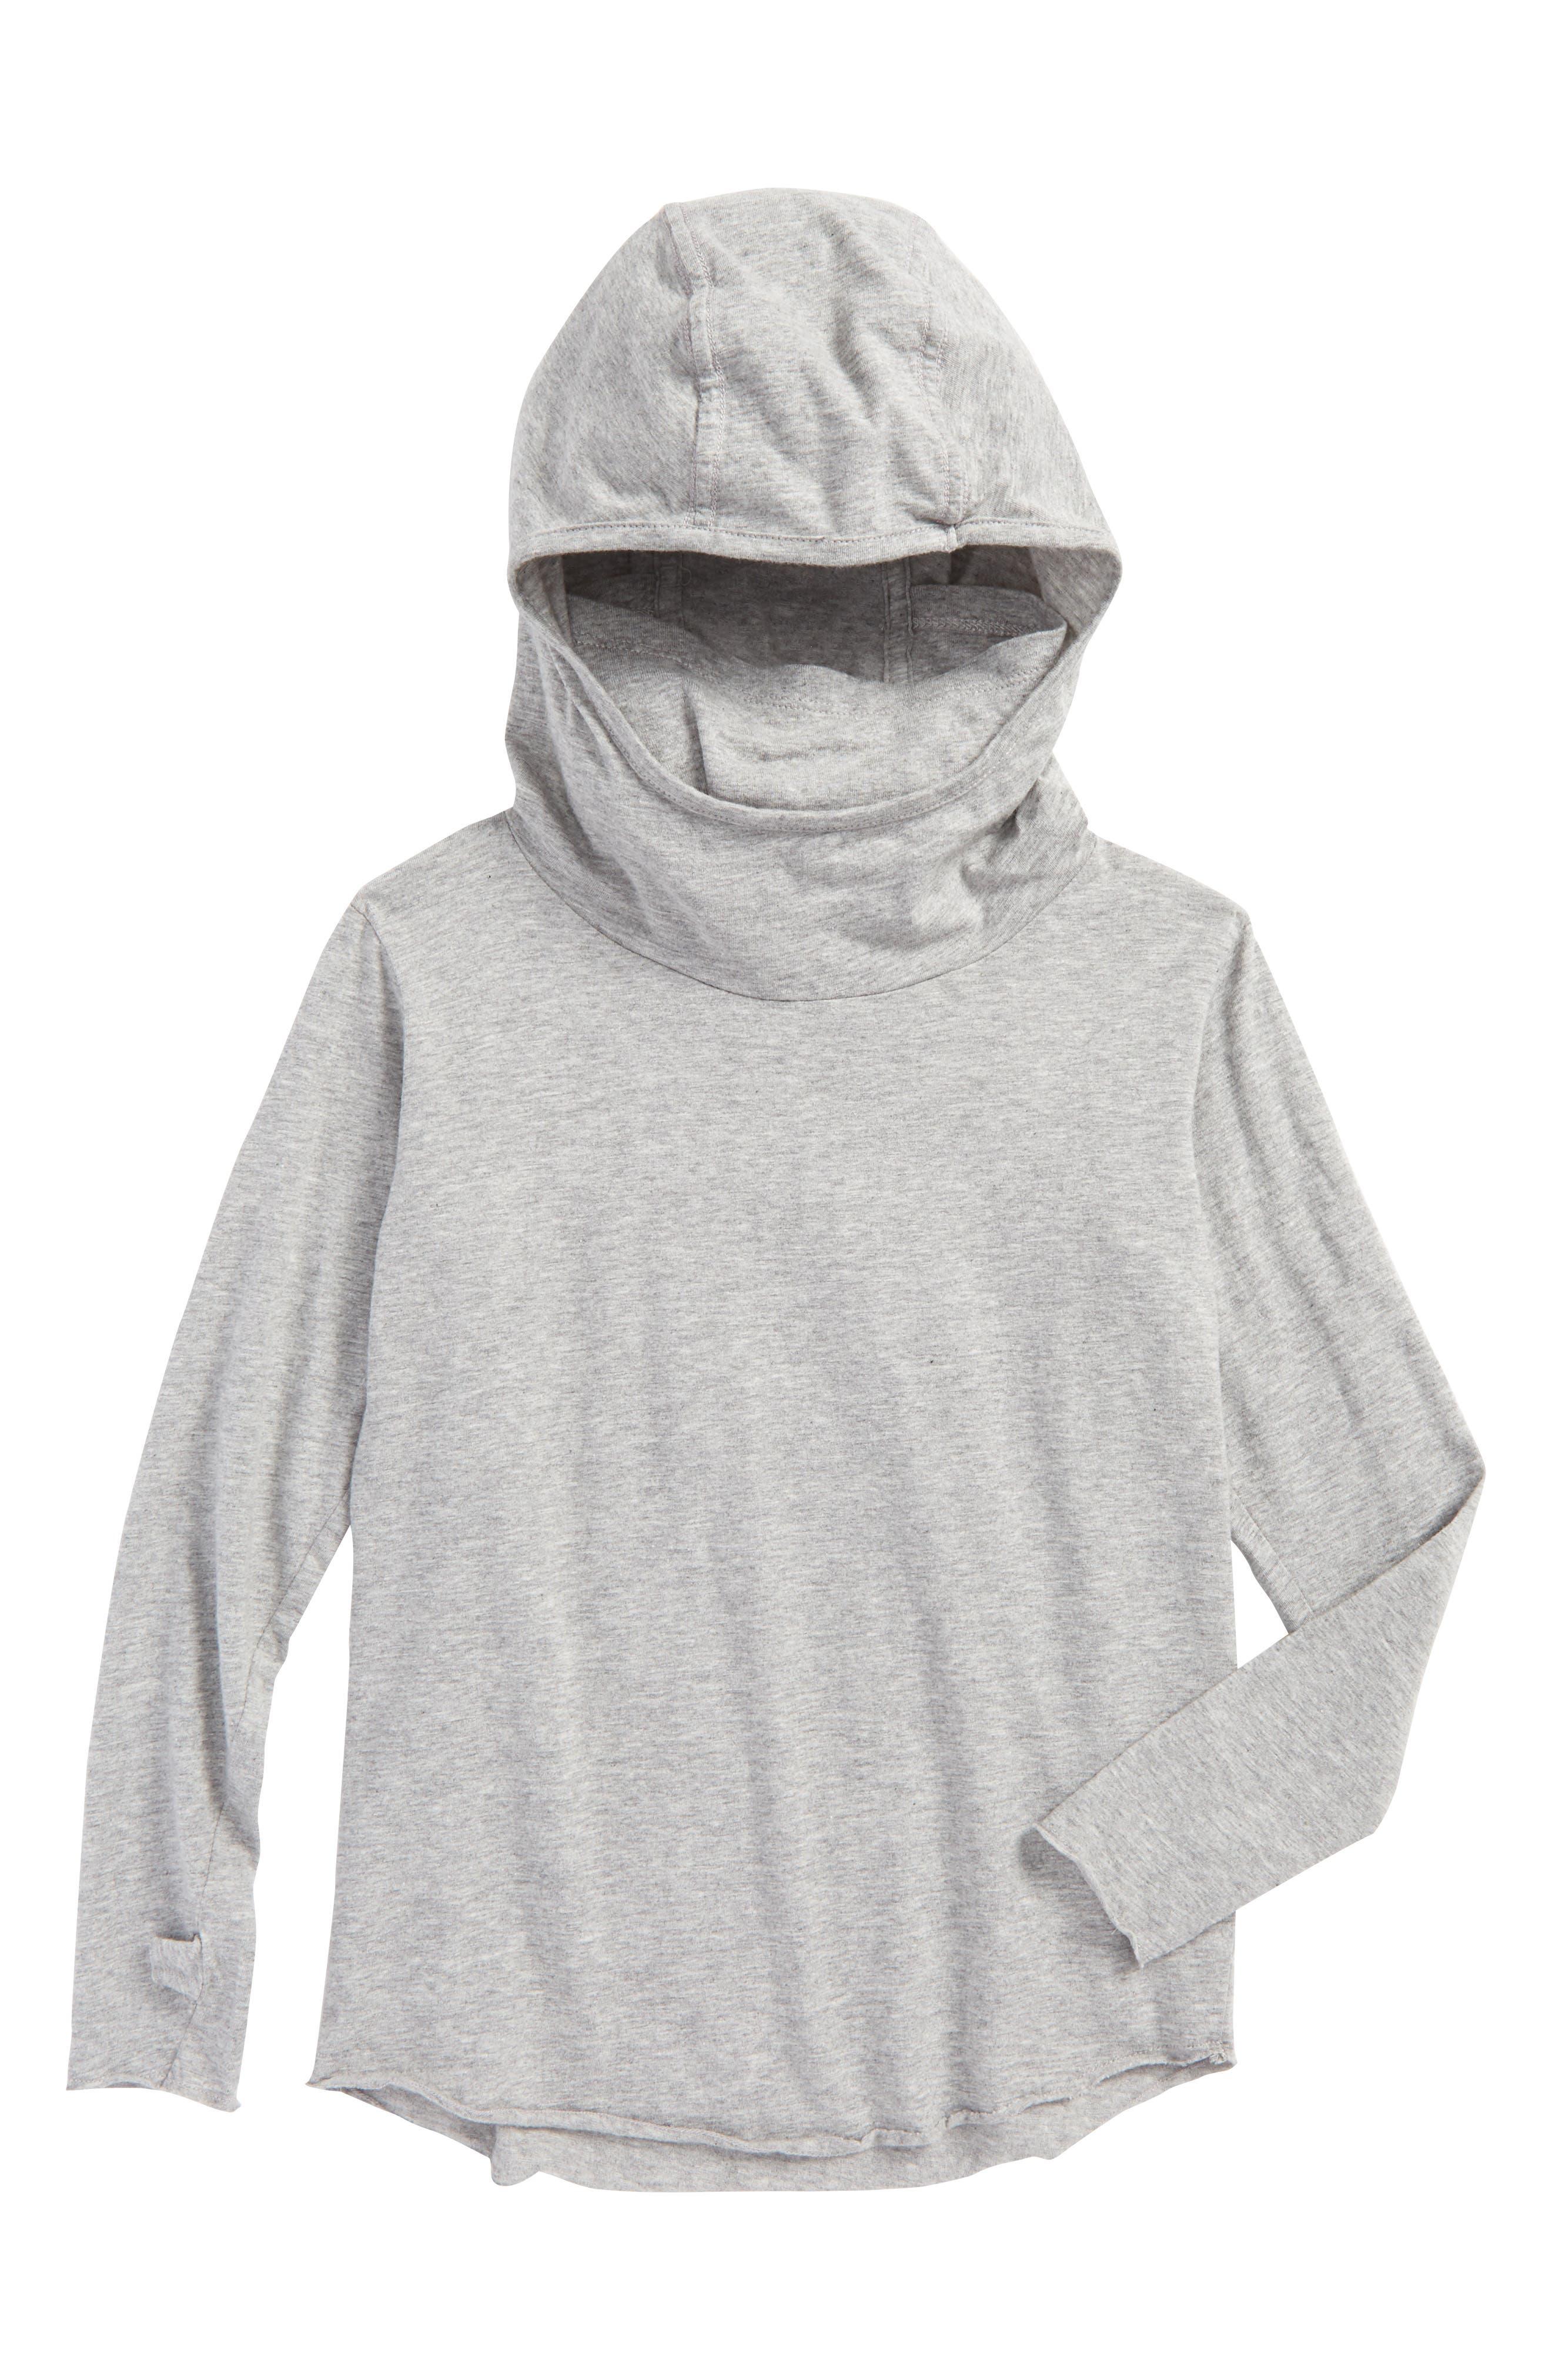 Main Image - NUNUNU Numbered Ninja Hooded T-Shirt (Toddler Boys & Little Boys)